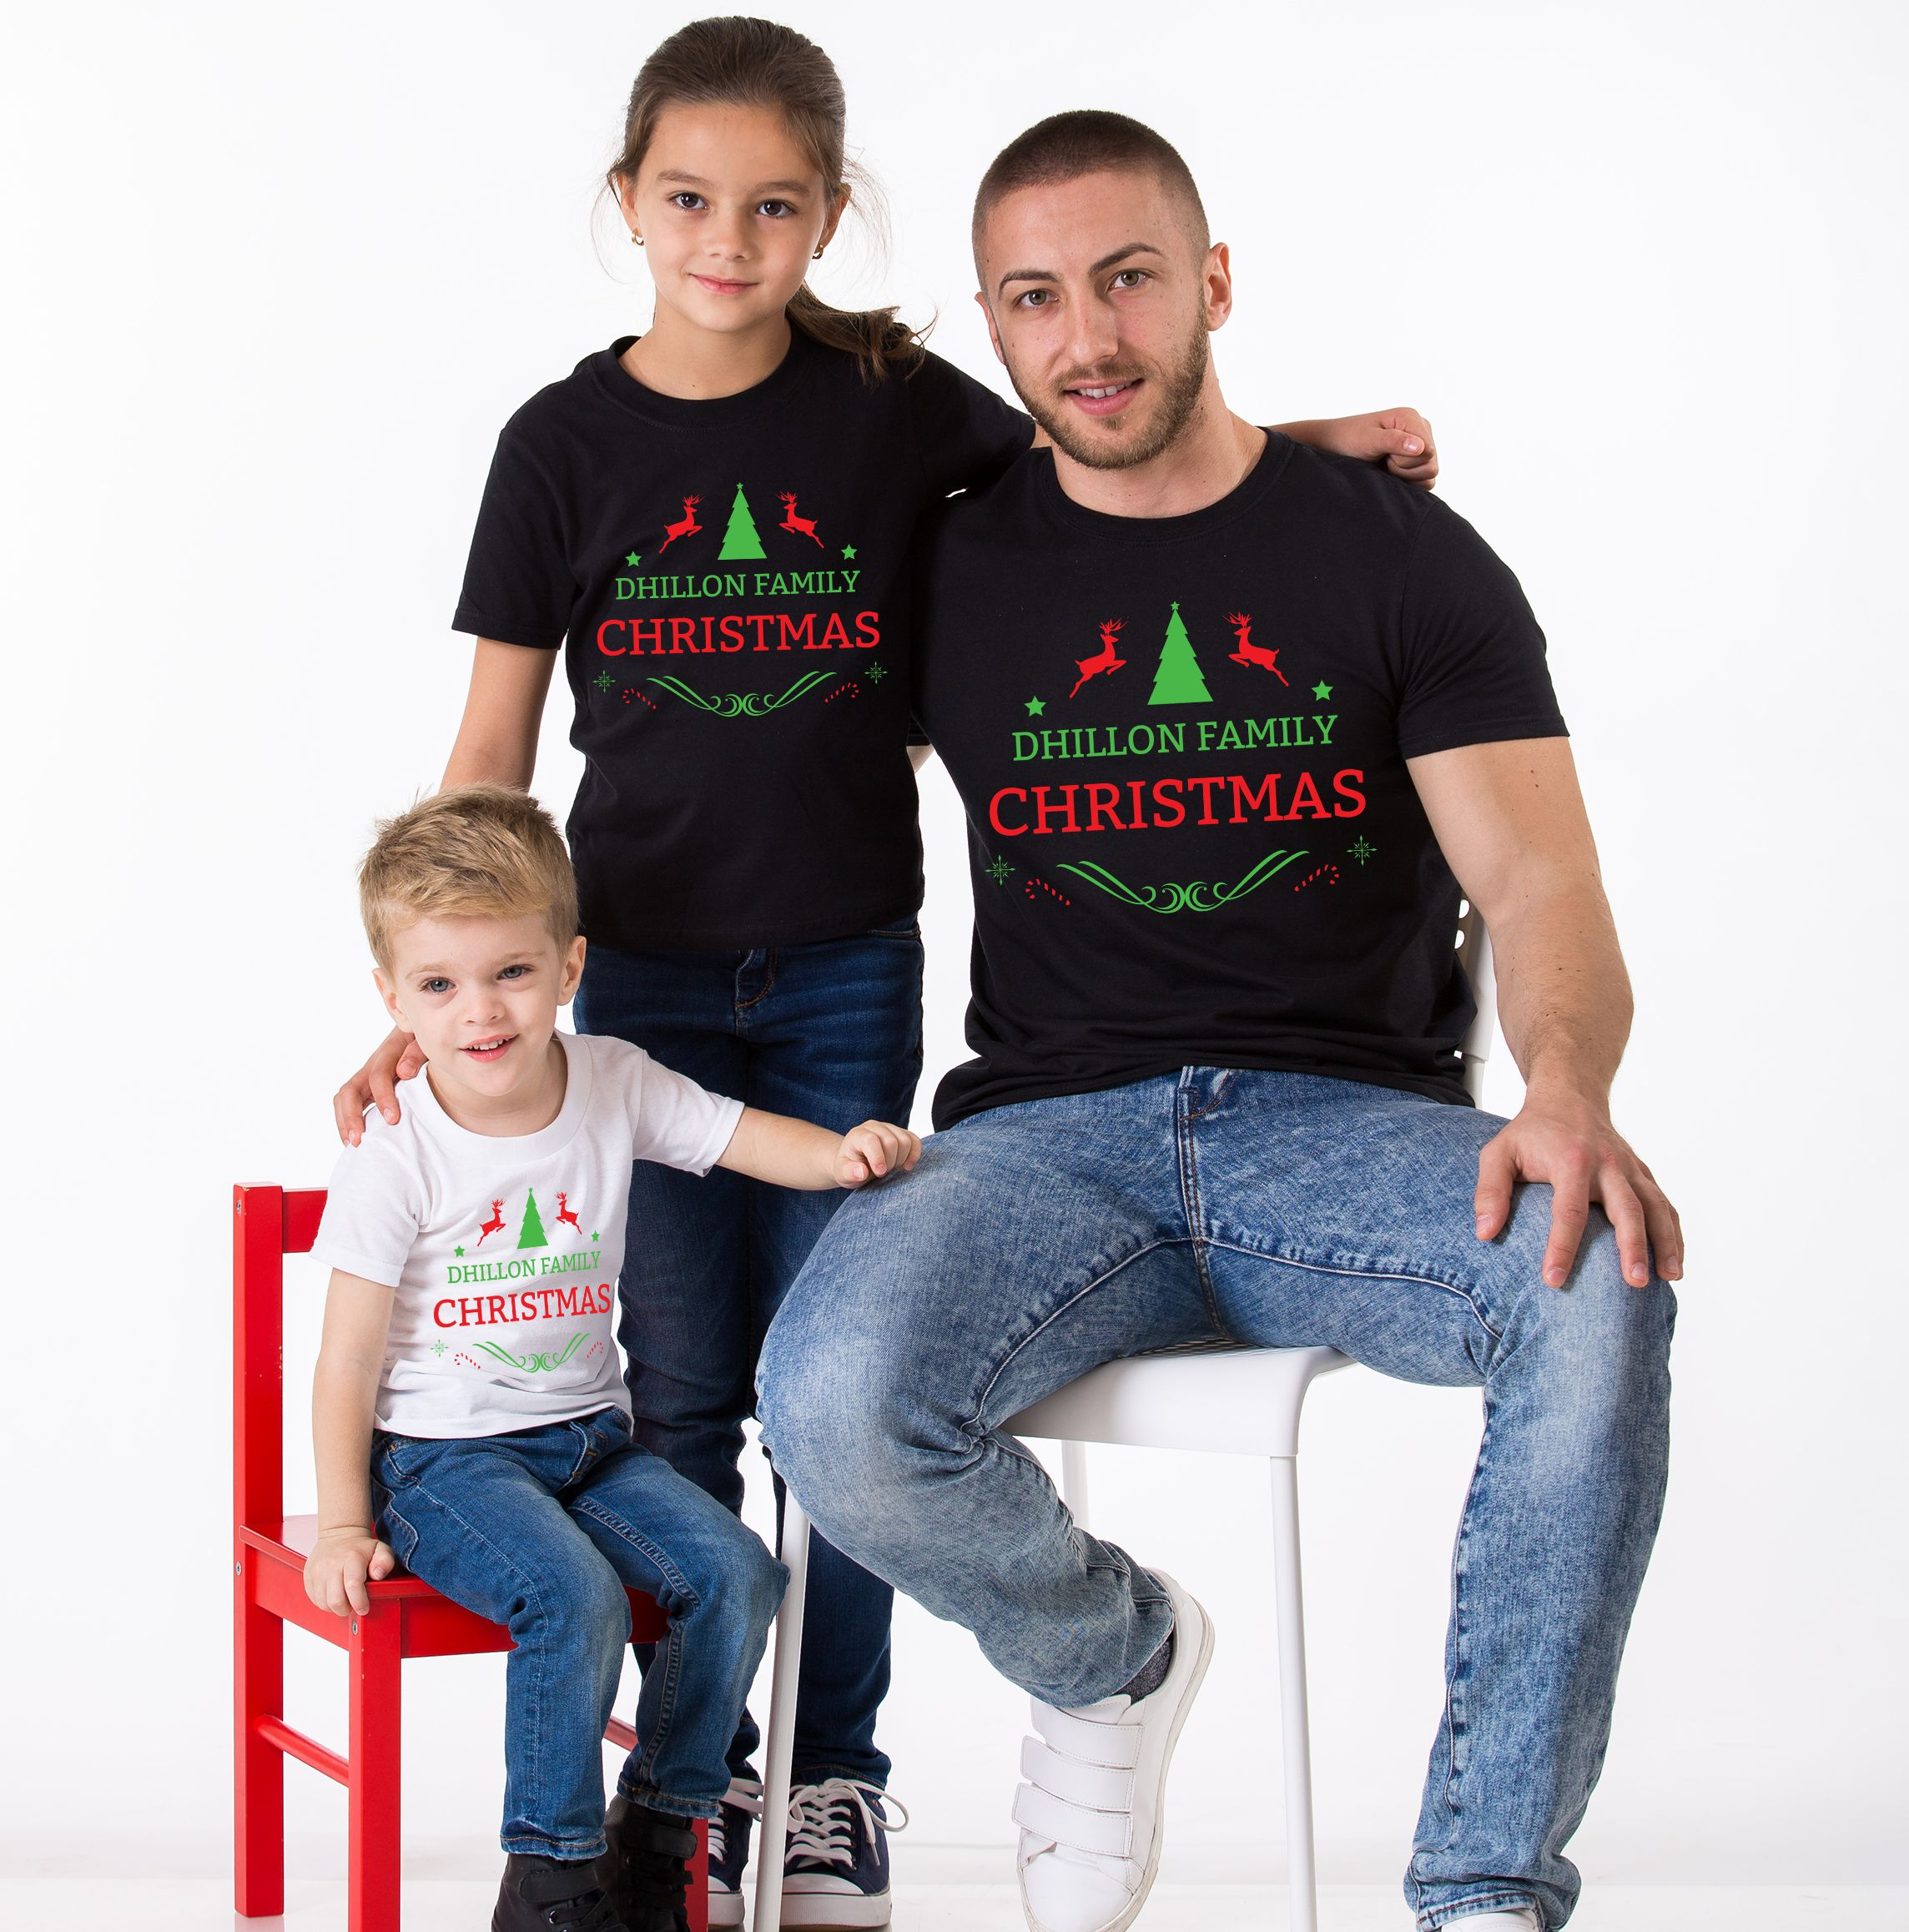 ca9080ea CUSTOM Name, Matching Family Christmas Shirts - Awesome Matching ...